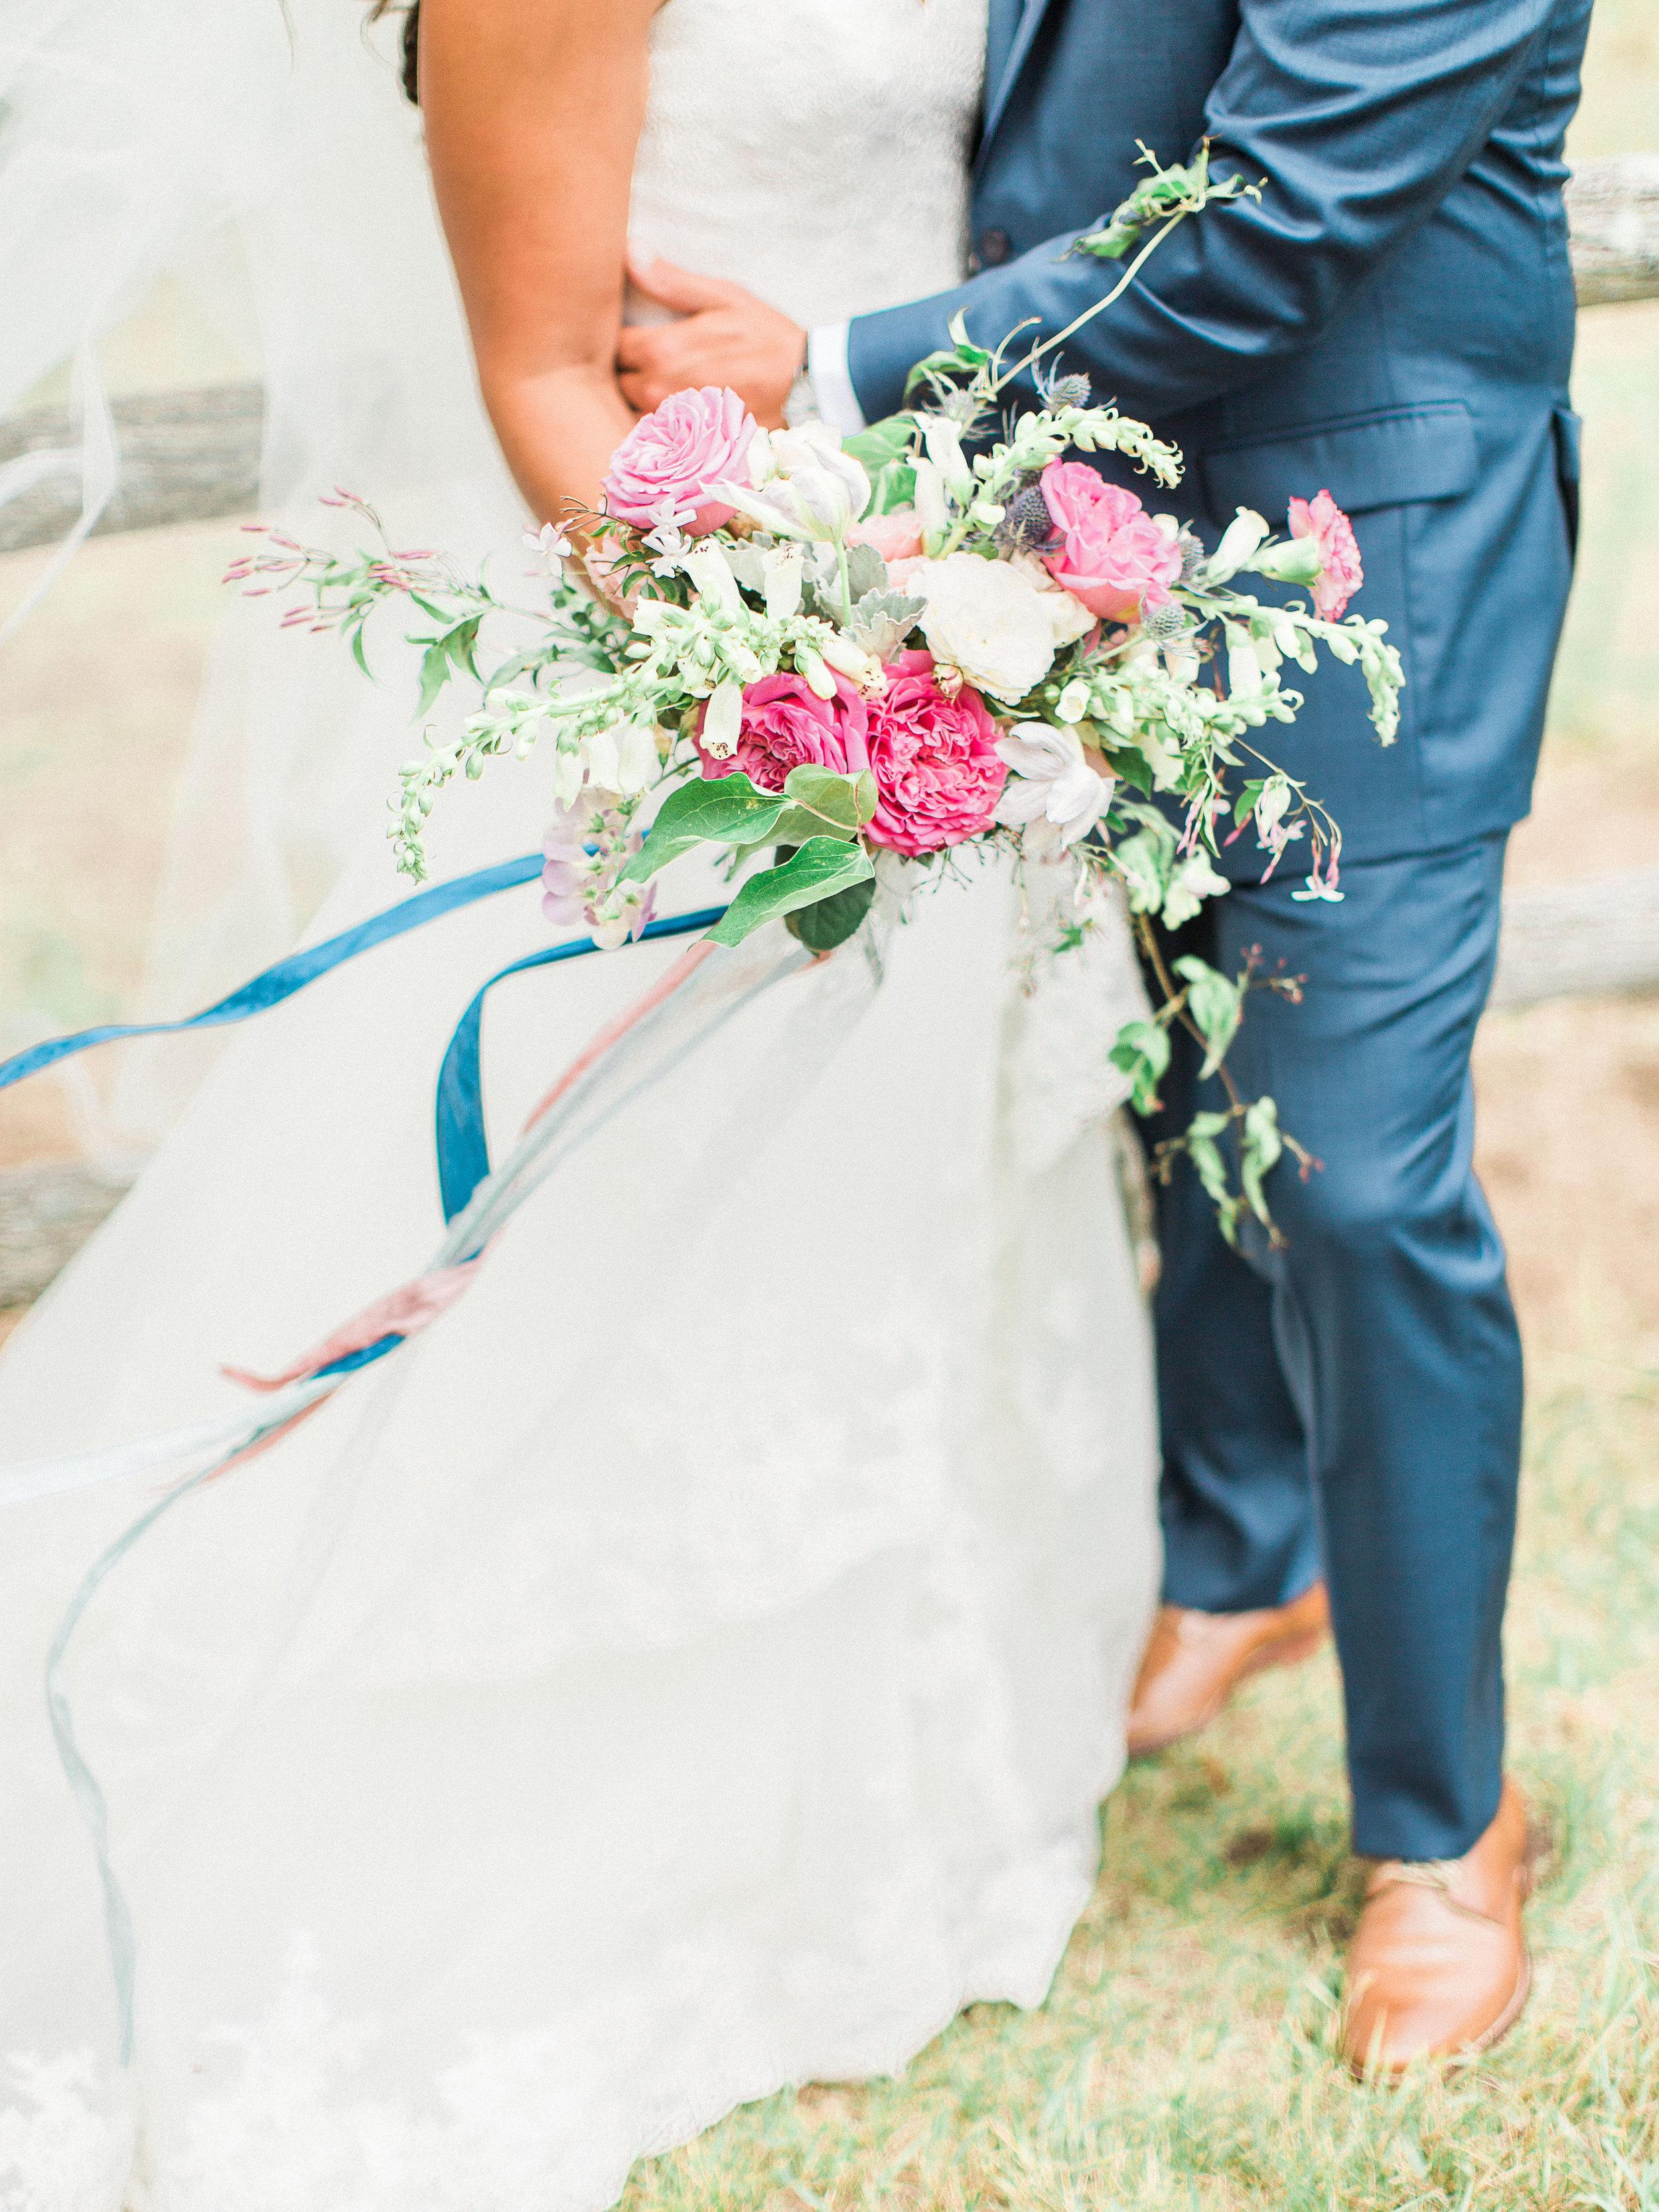 ERIC AND HALLIE WEDDING-HI RESOLUTION FOR PRINTING-0424.jpg